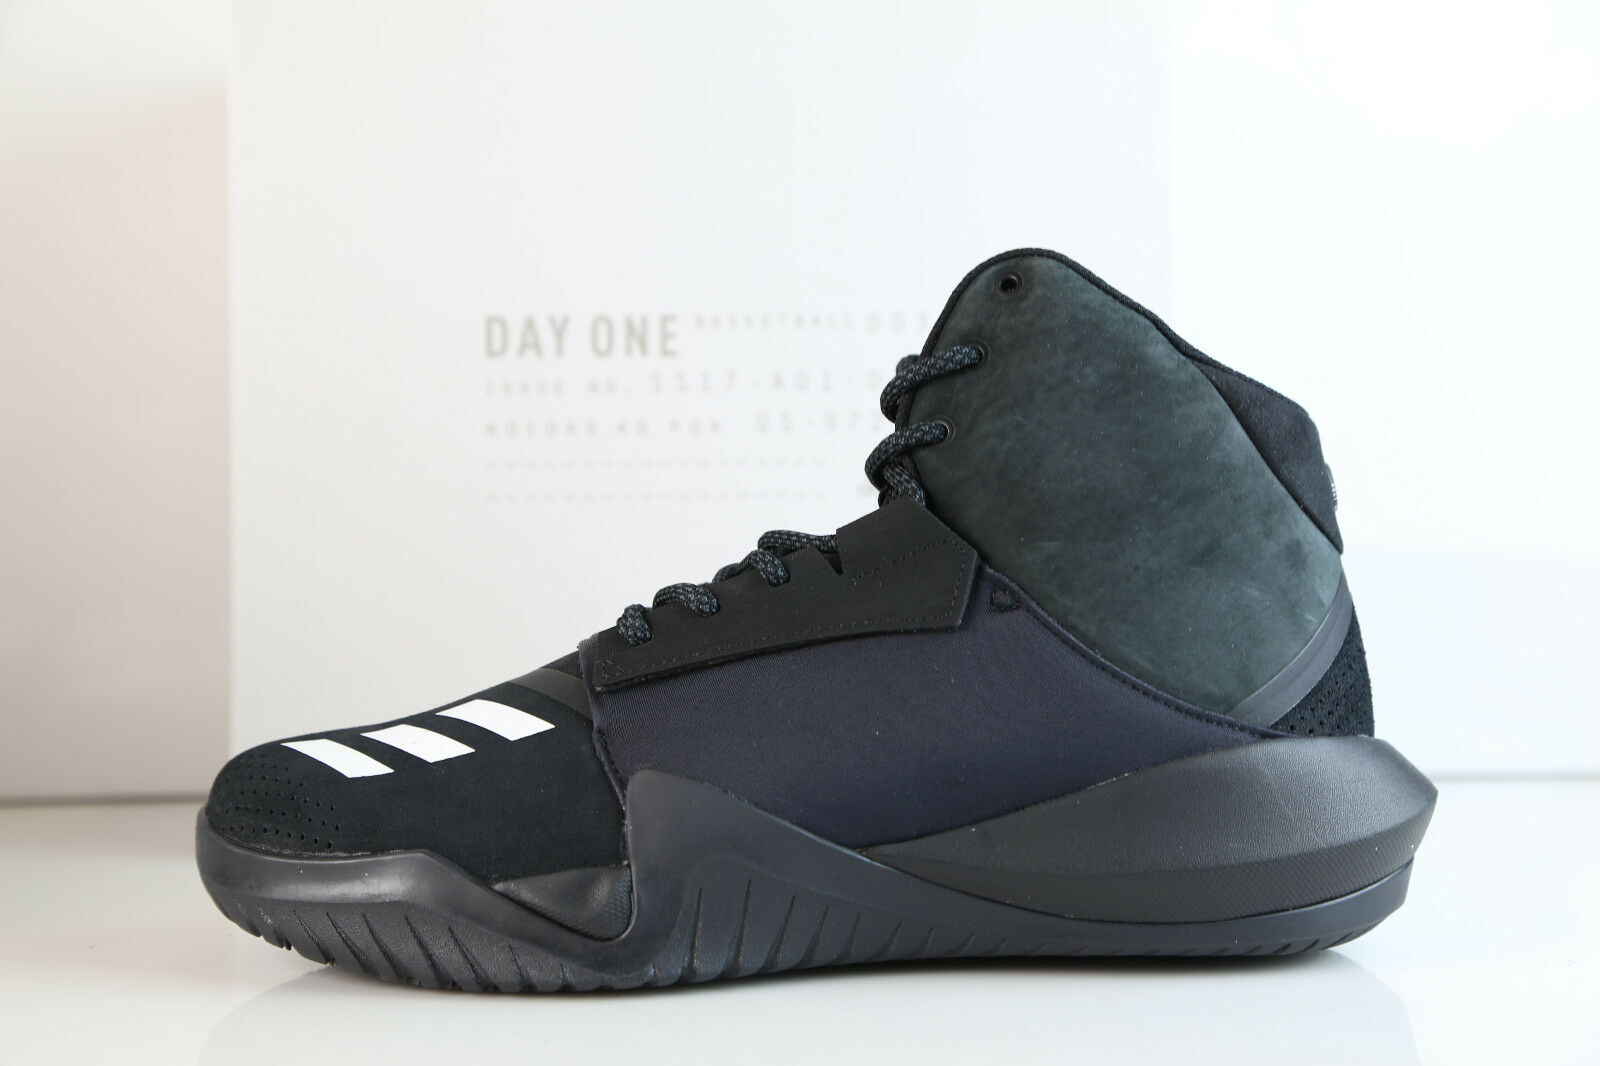 Adidas x tag lärm verrückt team schwarz - weiß - by2870 7-13.5 auftrieb - basketball